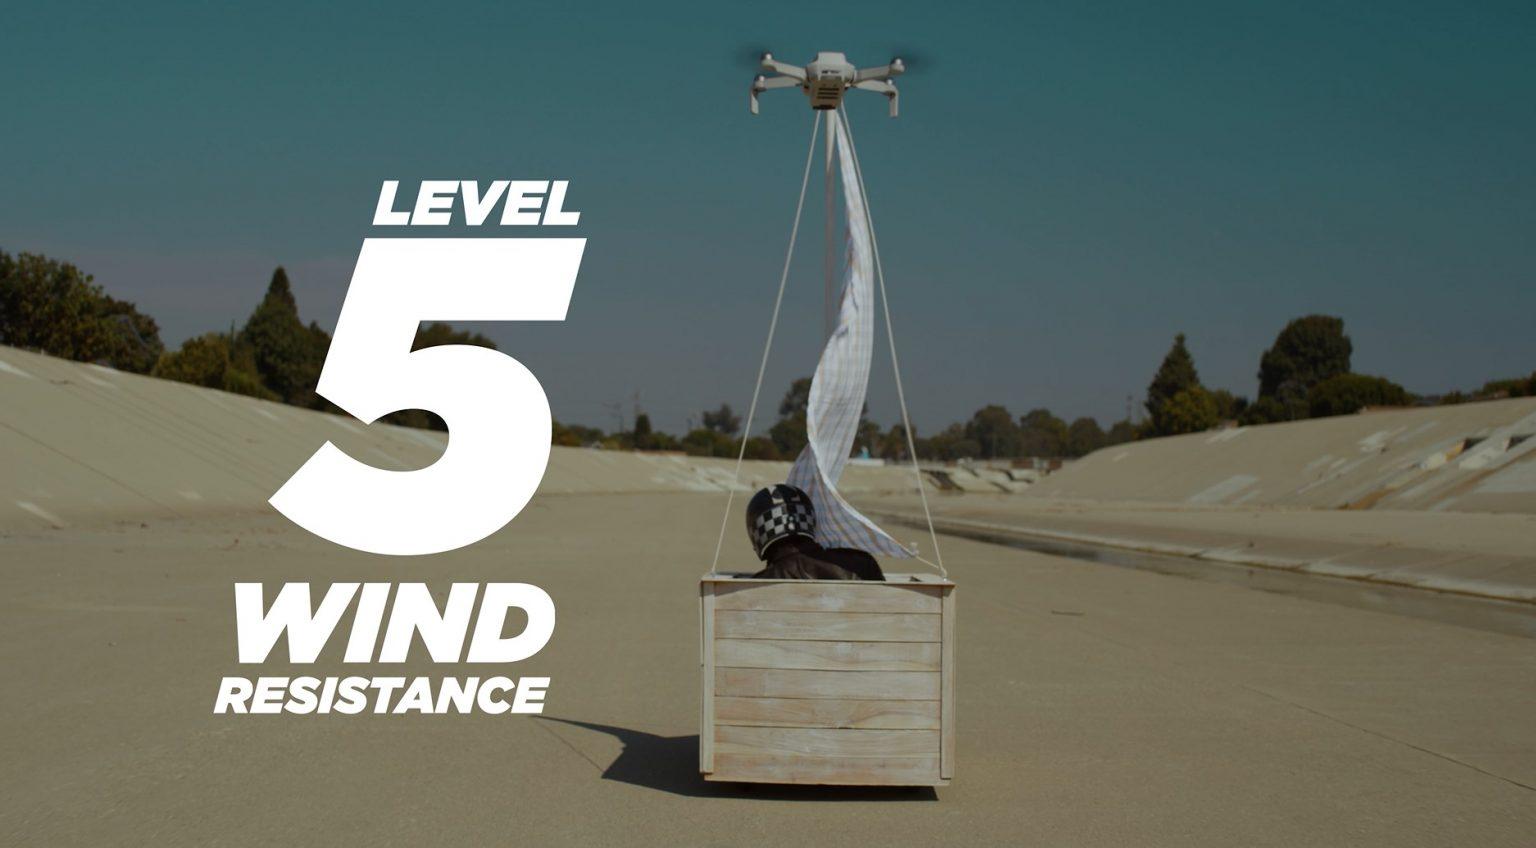 wind-resistance-1536x848-1